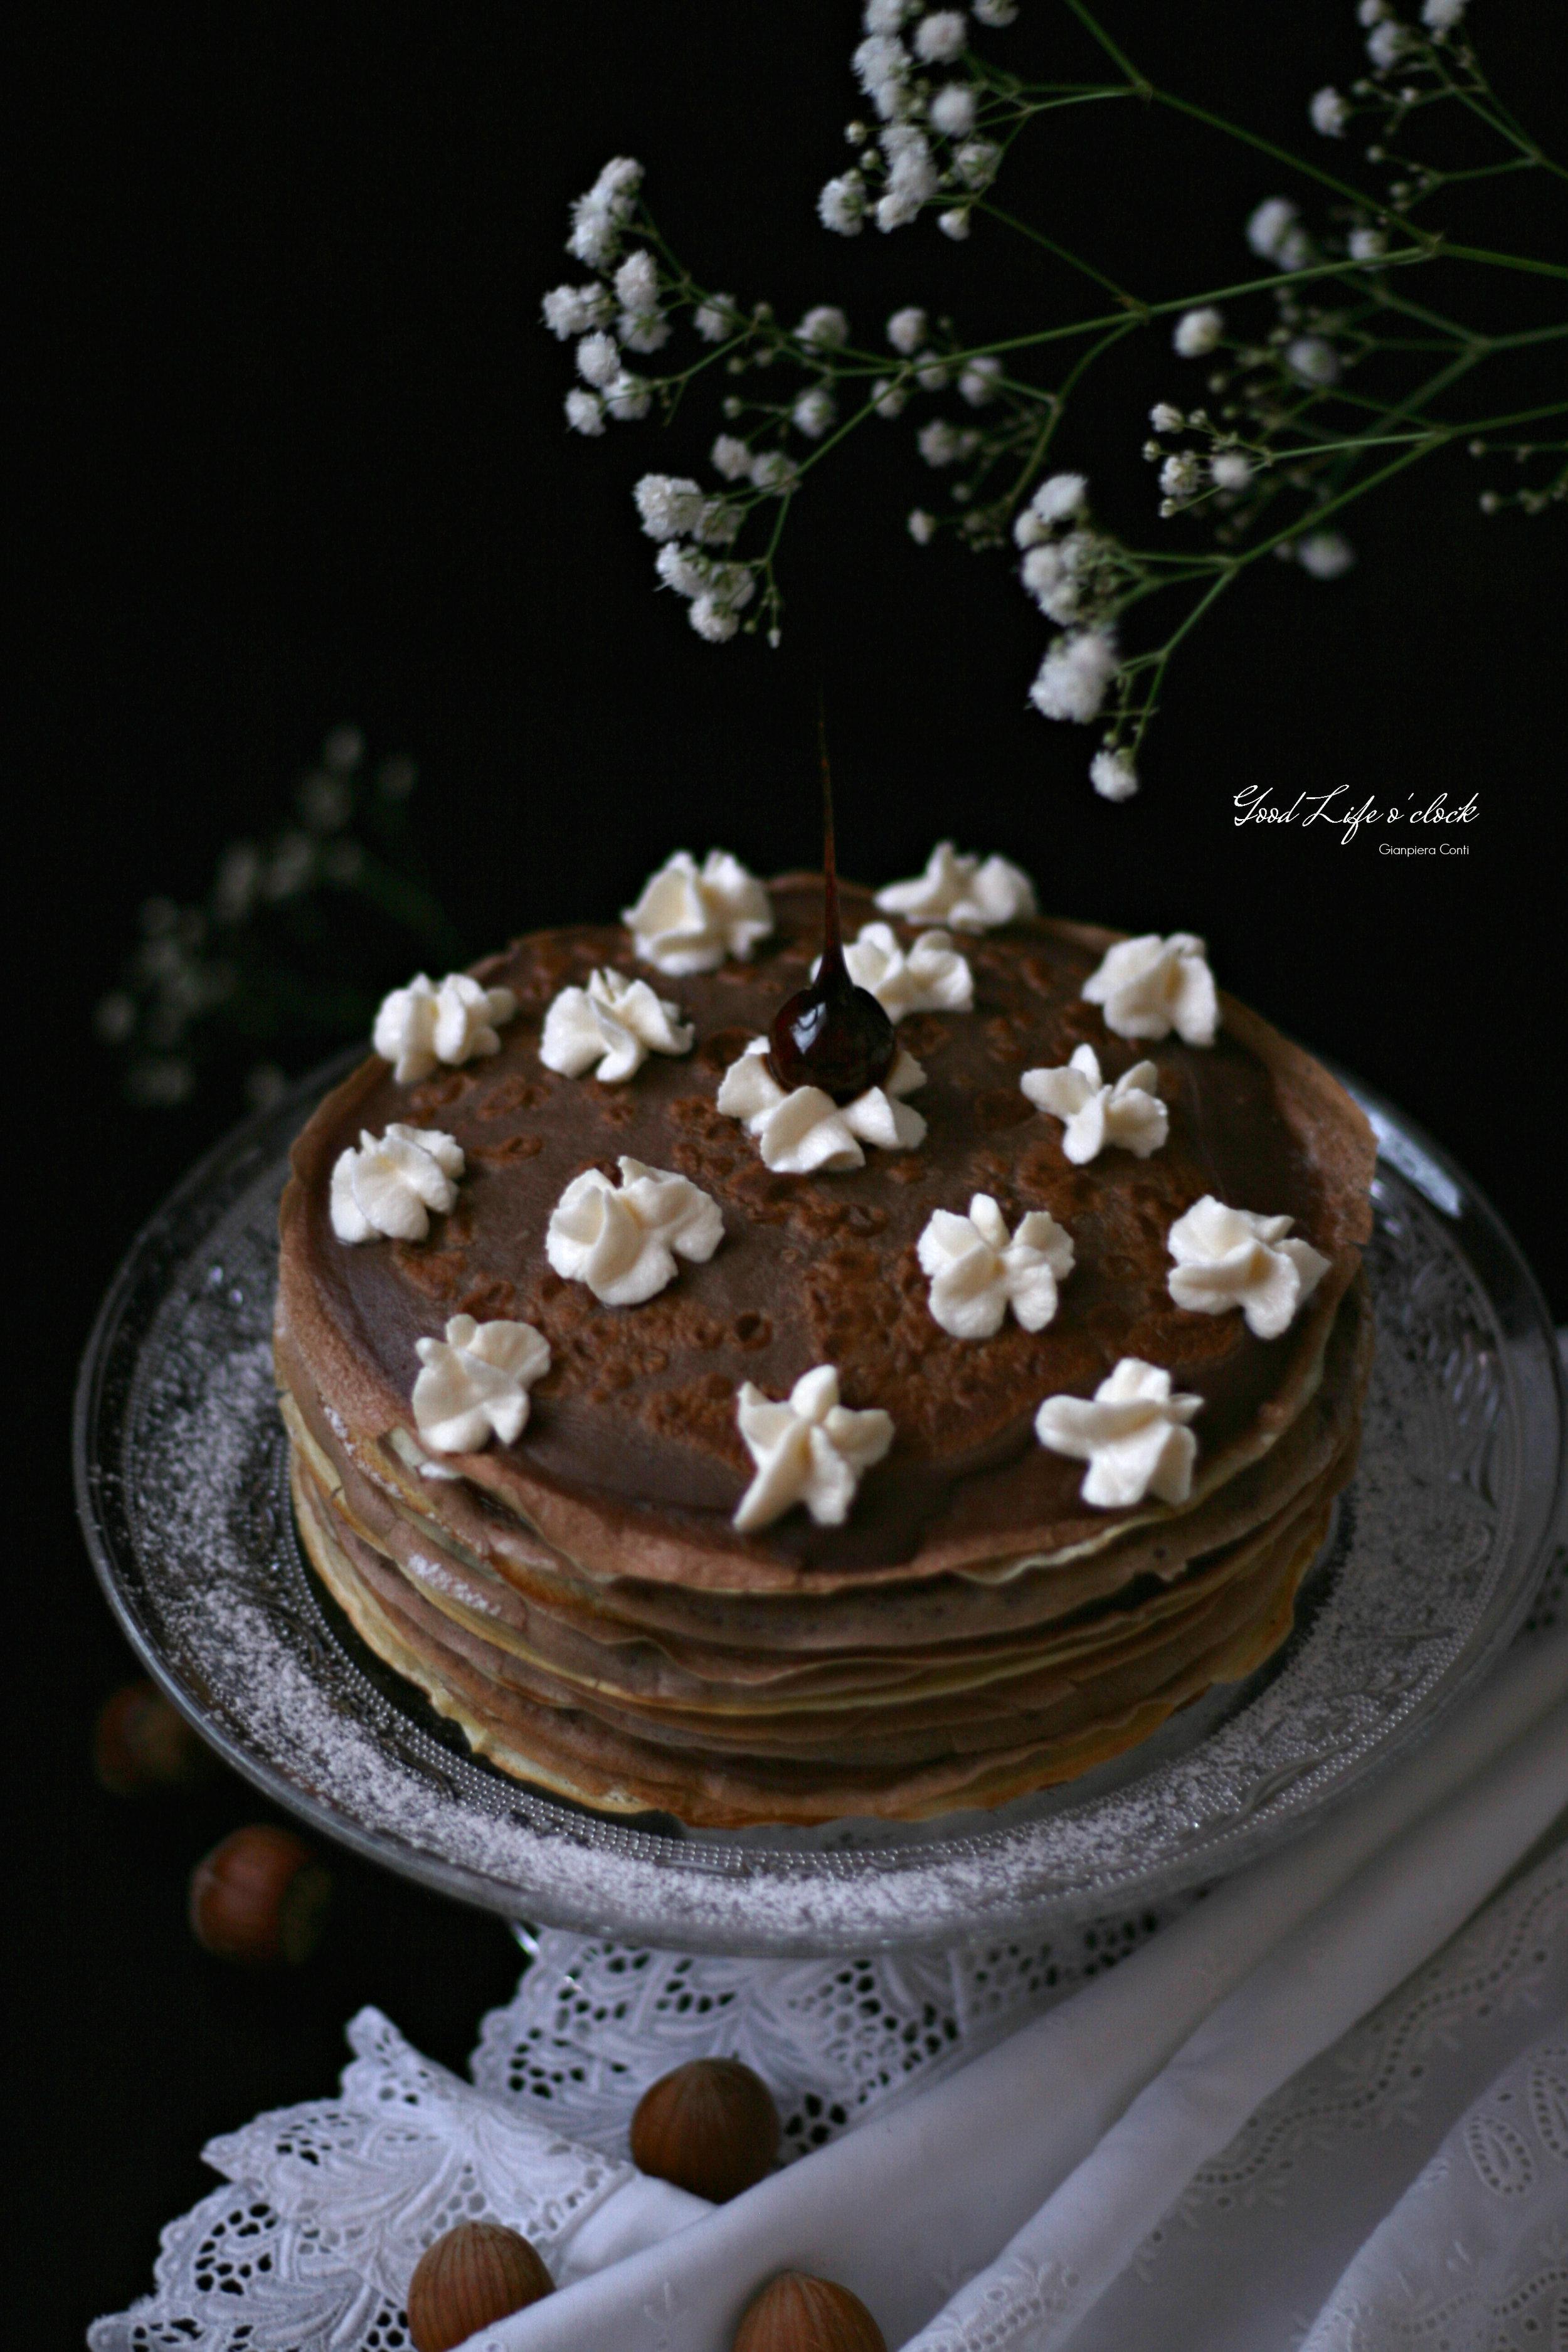 choco-vanilla-crepe-cake-gloc-gc-1